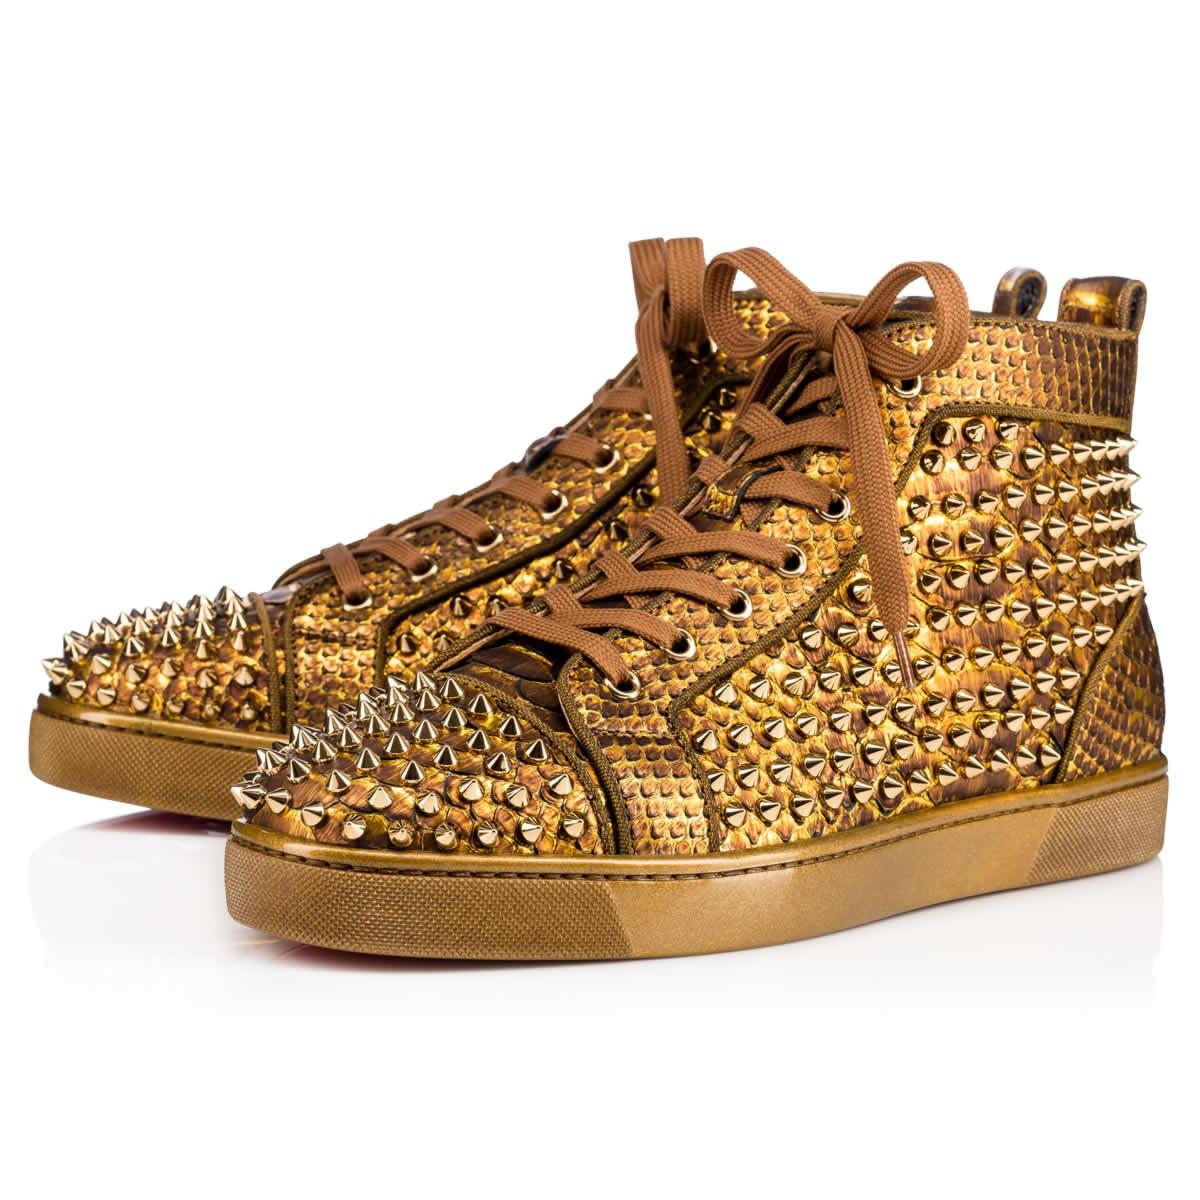 89da778f86df Christian Louboutin Louis Spikes Orlato Flat Antic Gold Python Cuirasse -  Men Shoes -